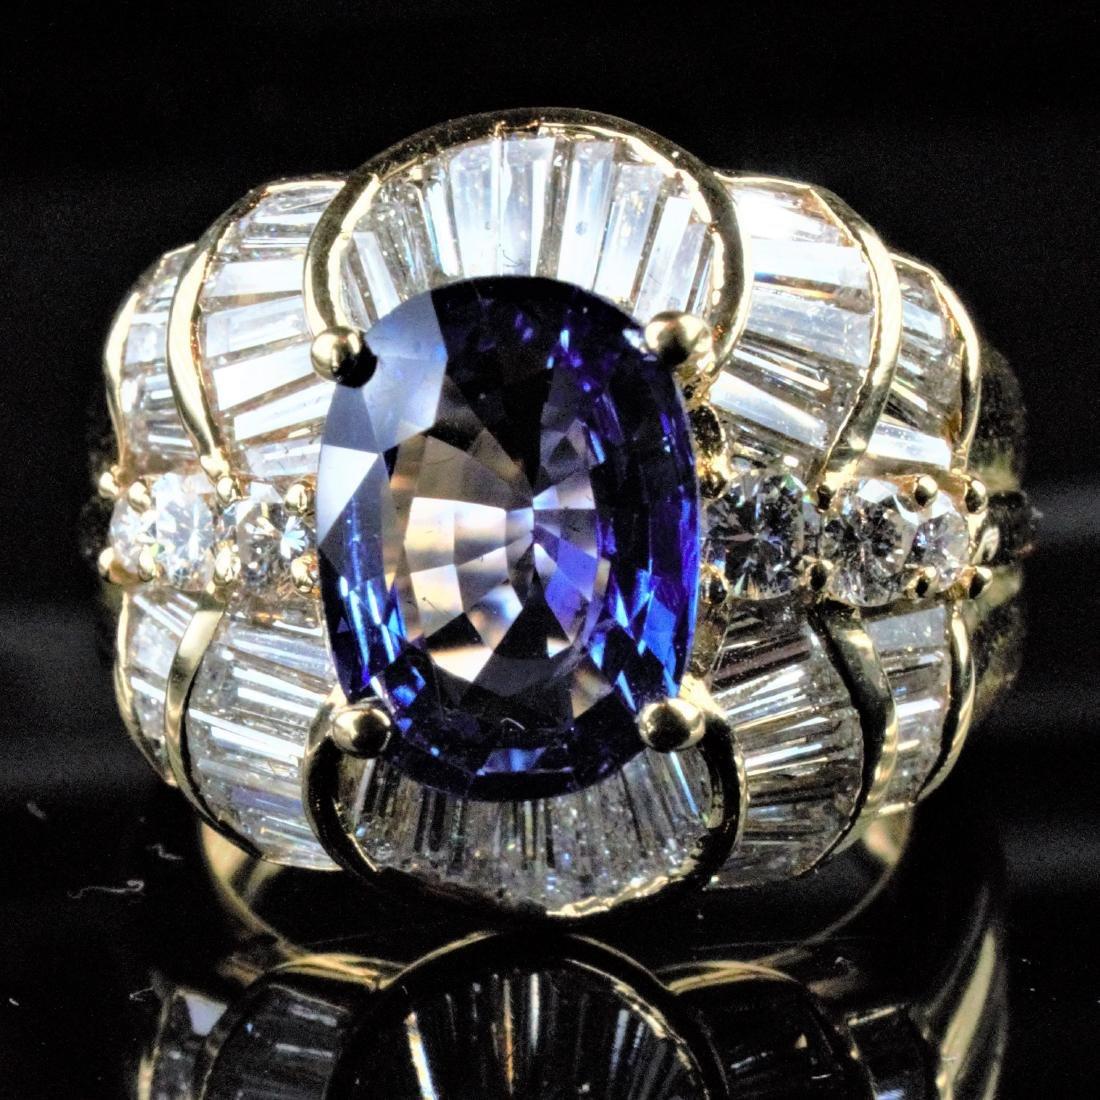 14k YG 2.25 CT Sapphire and Diamond Ring sz7 - 2